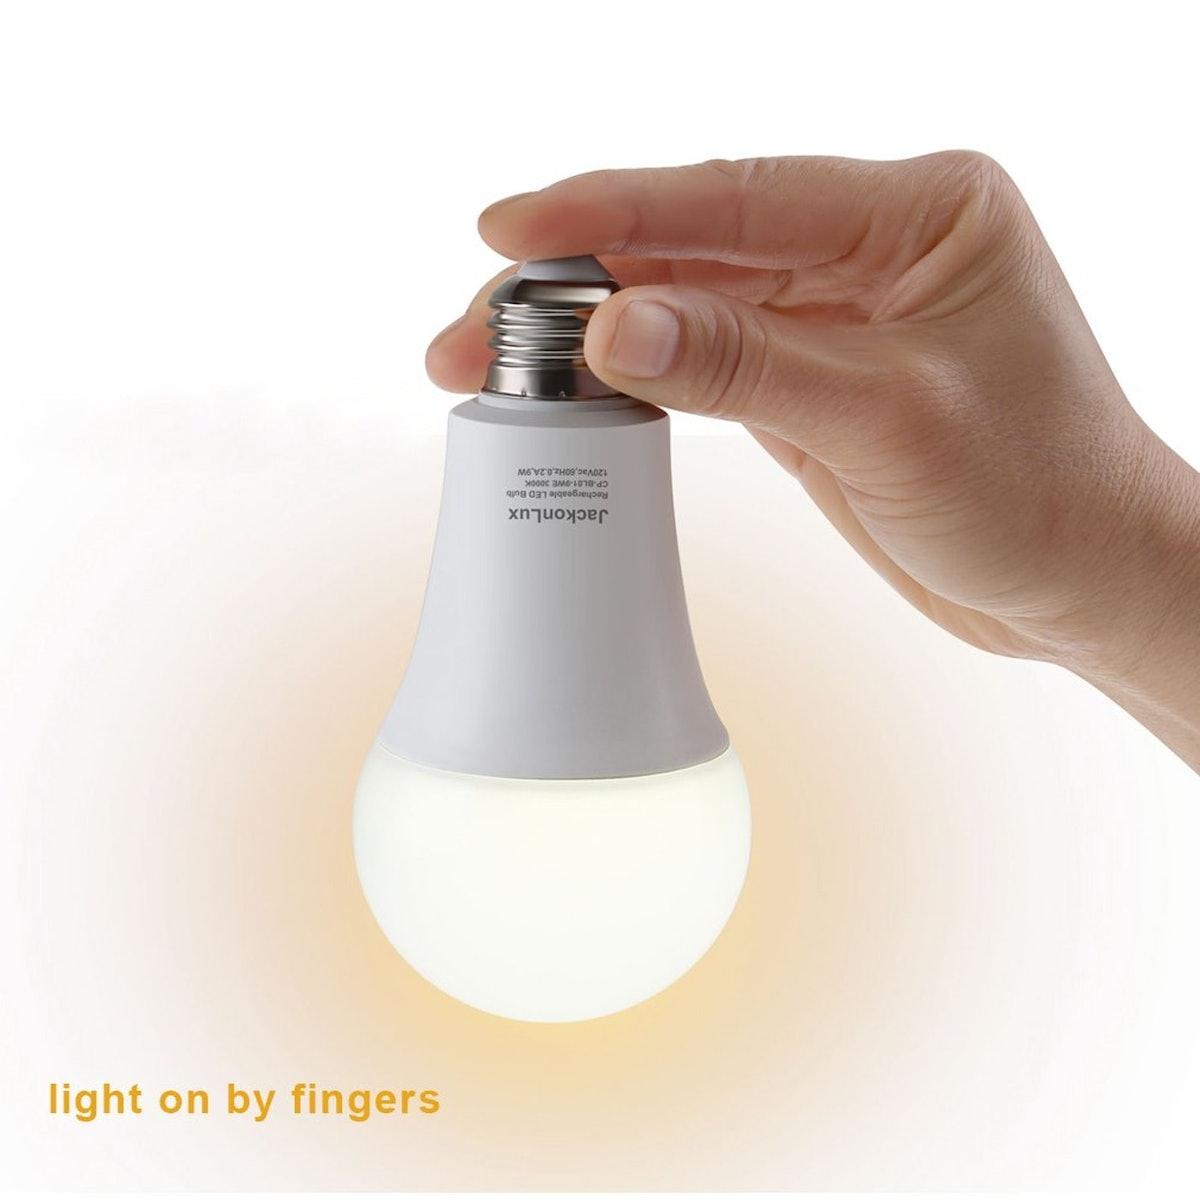 JackonLux Rechargeable Emergency Light Bulbs (2 Pack)